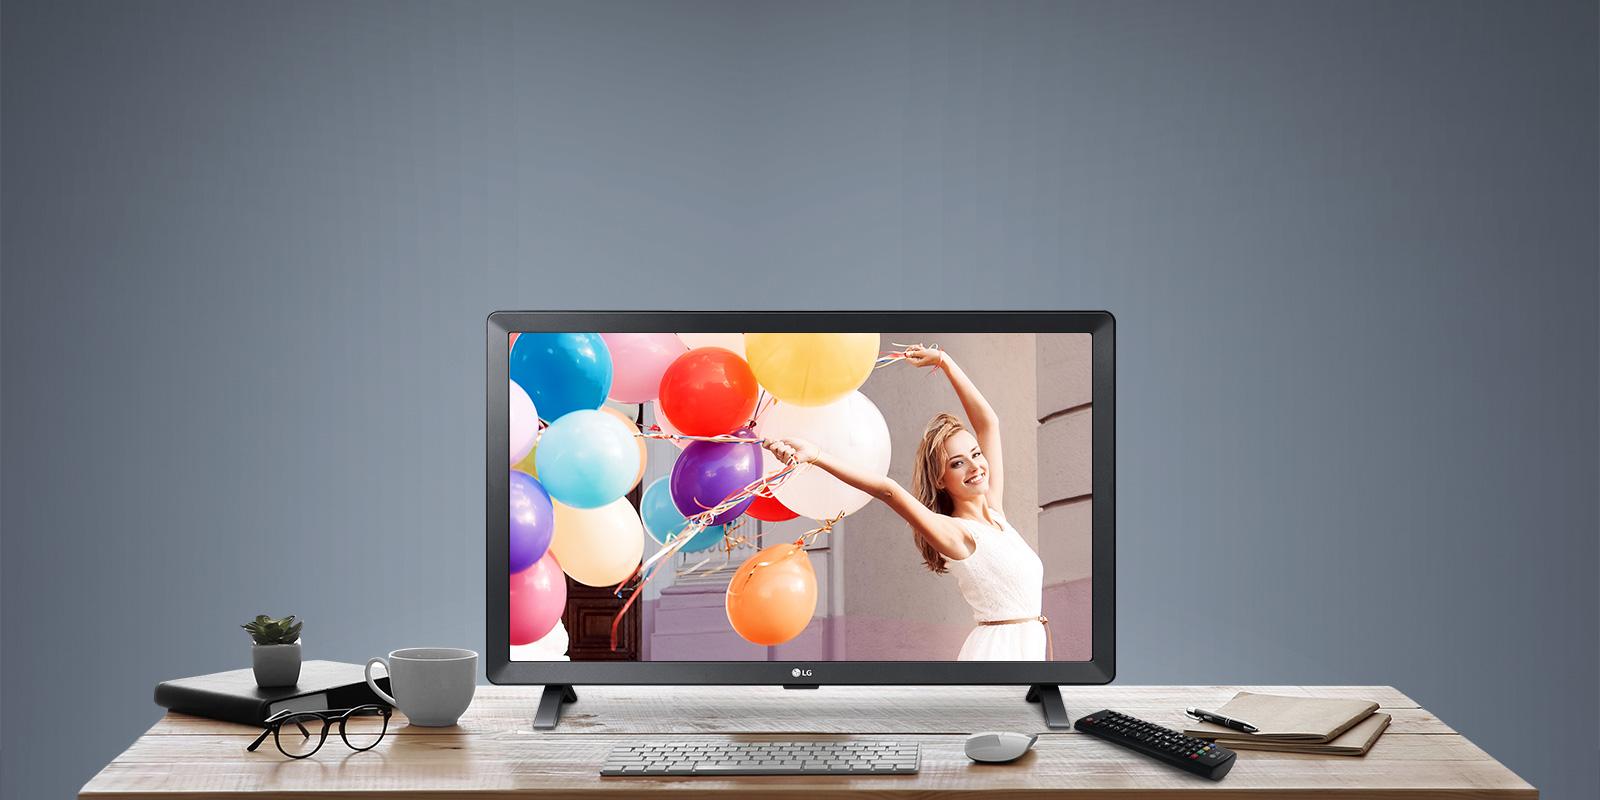 Economico TV LED LG 24TL520V da 99 euro: in offerta da Esselunga